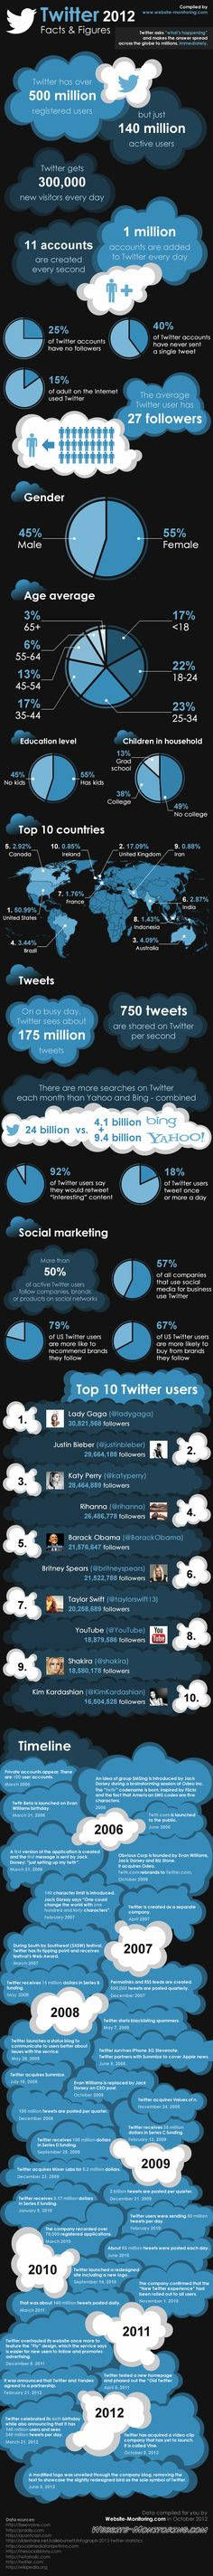 Twitter Report - 2012